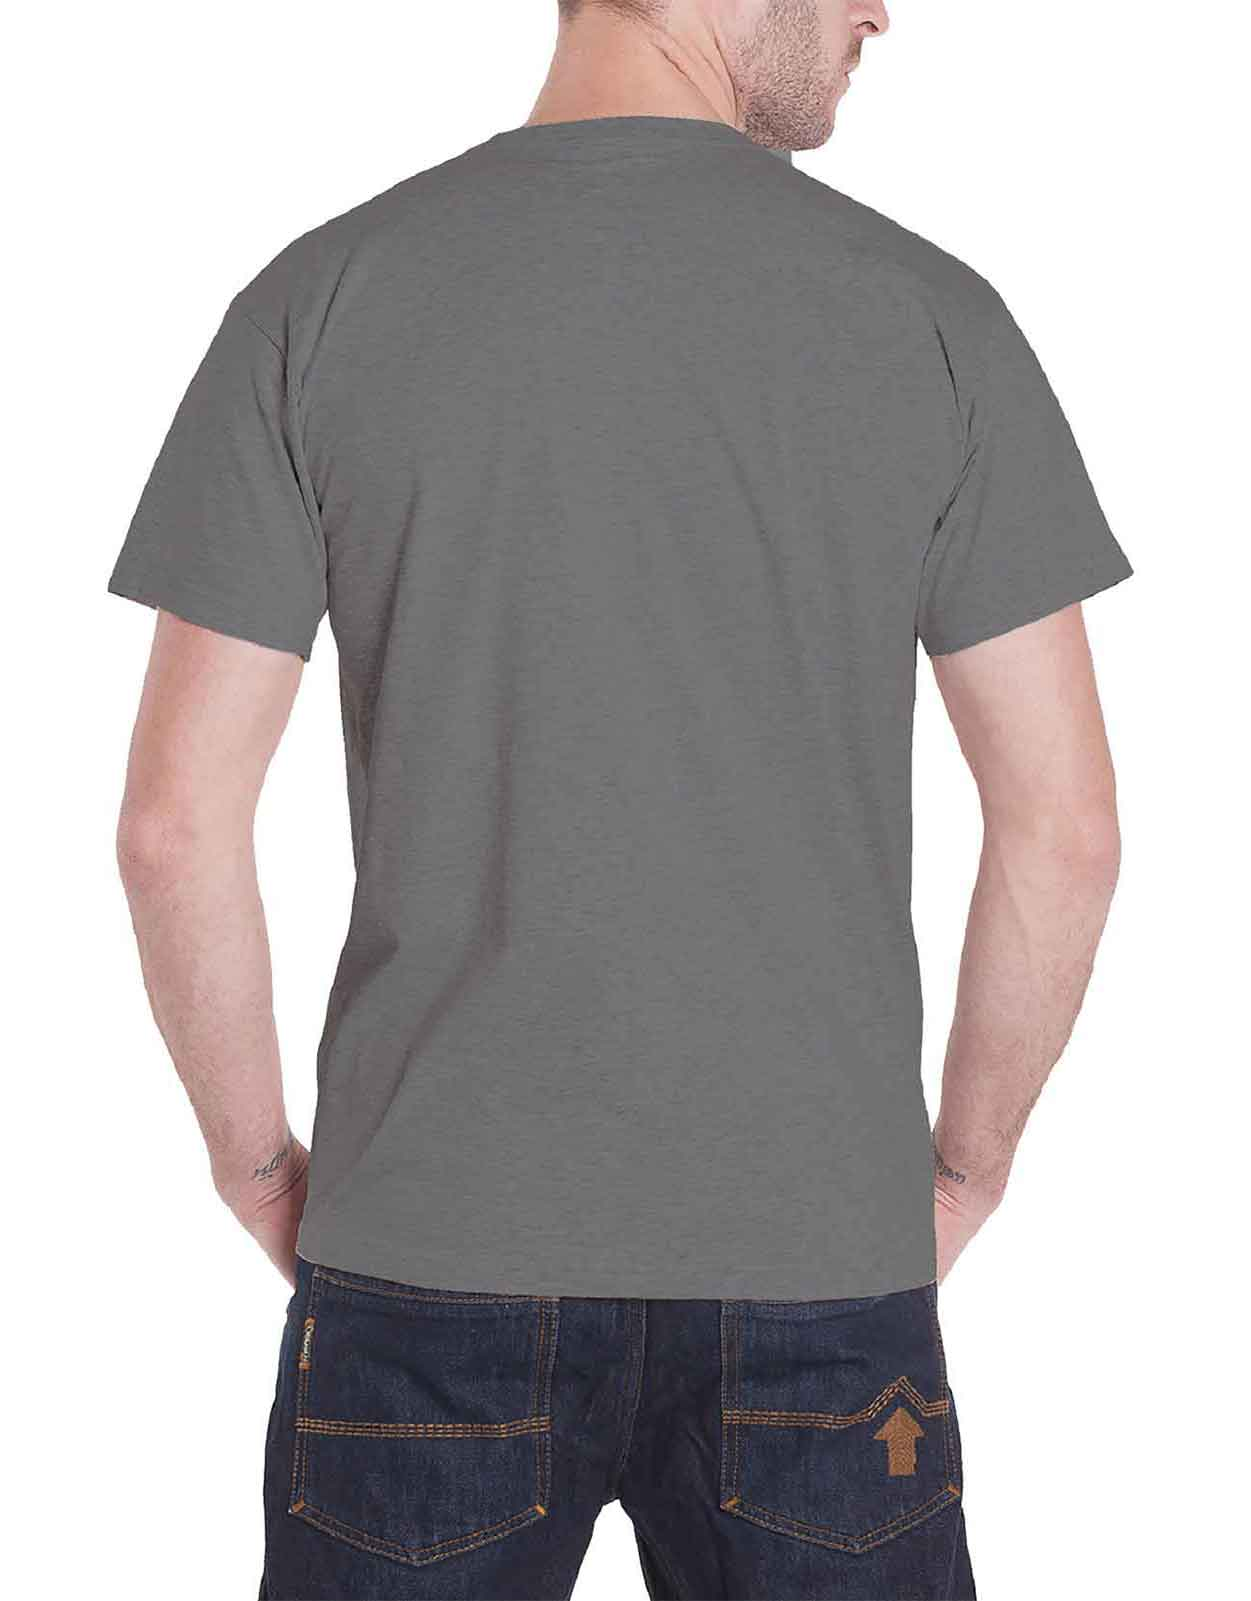 Motorhead-T-Shirt-Lemmy-RIP-England-warpig-clean-your-clock-official-new-mens Indexbild 21